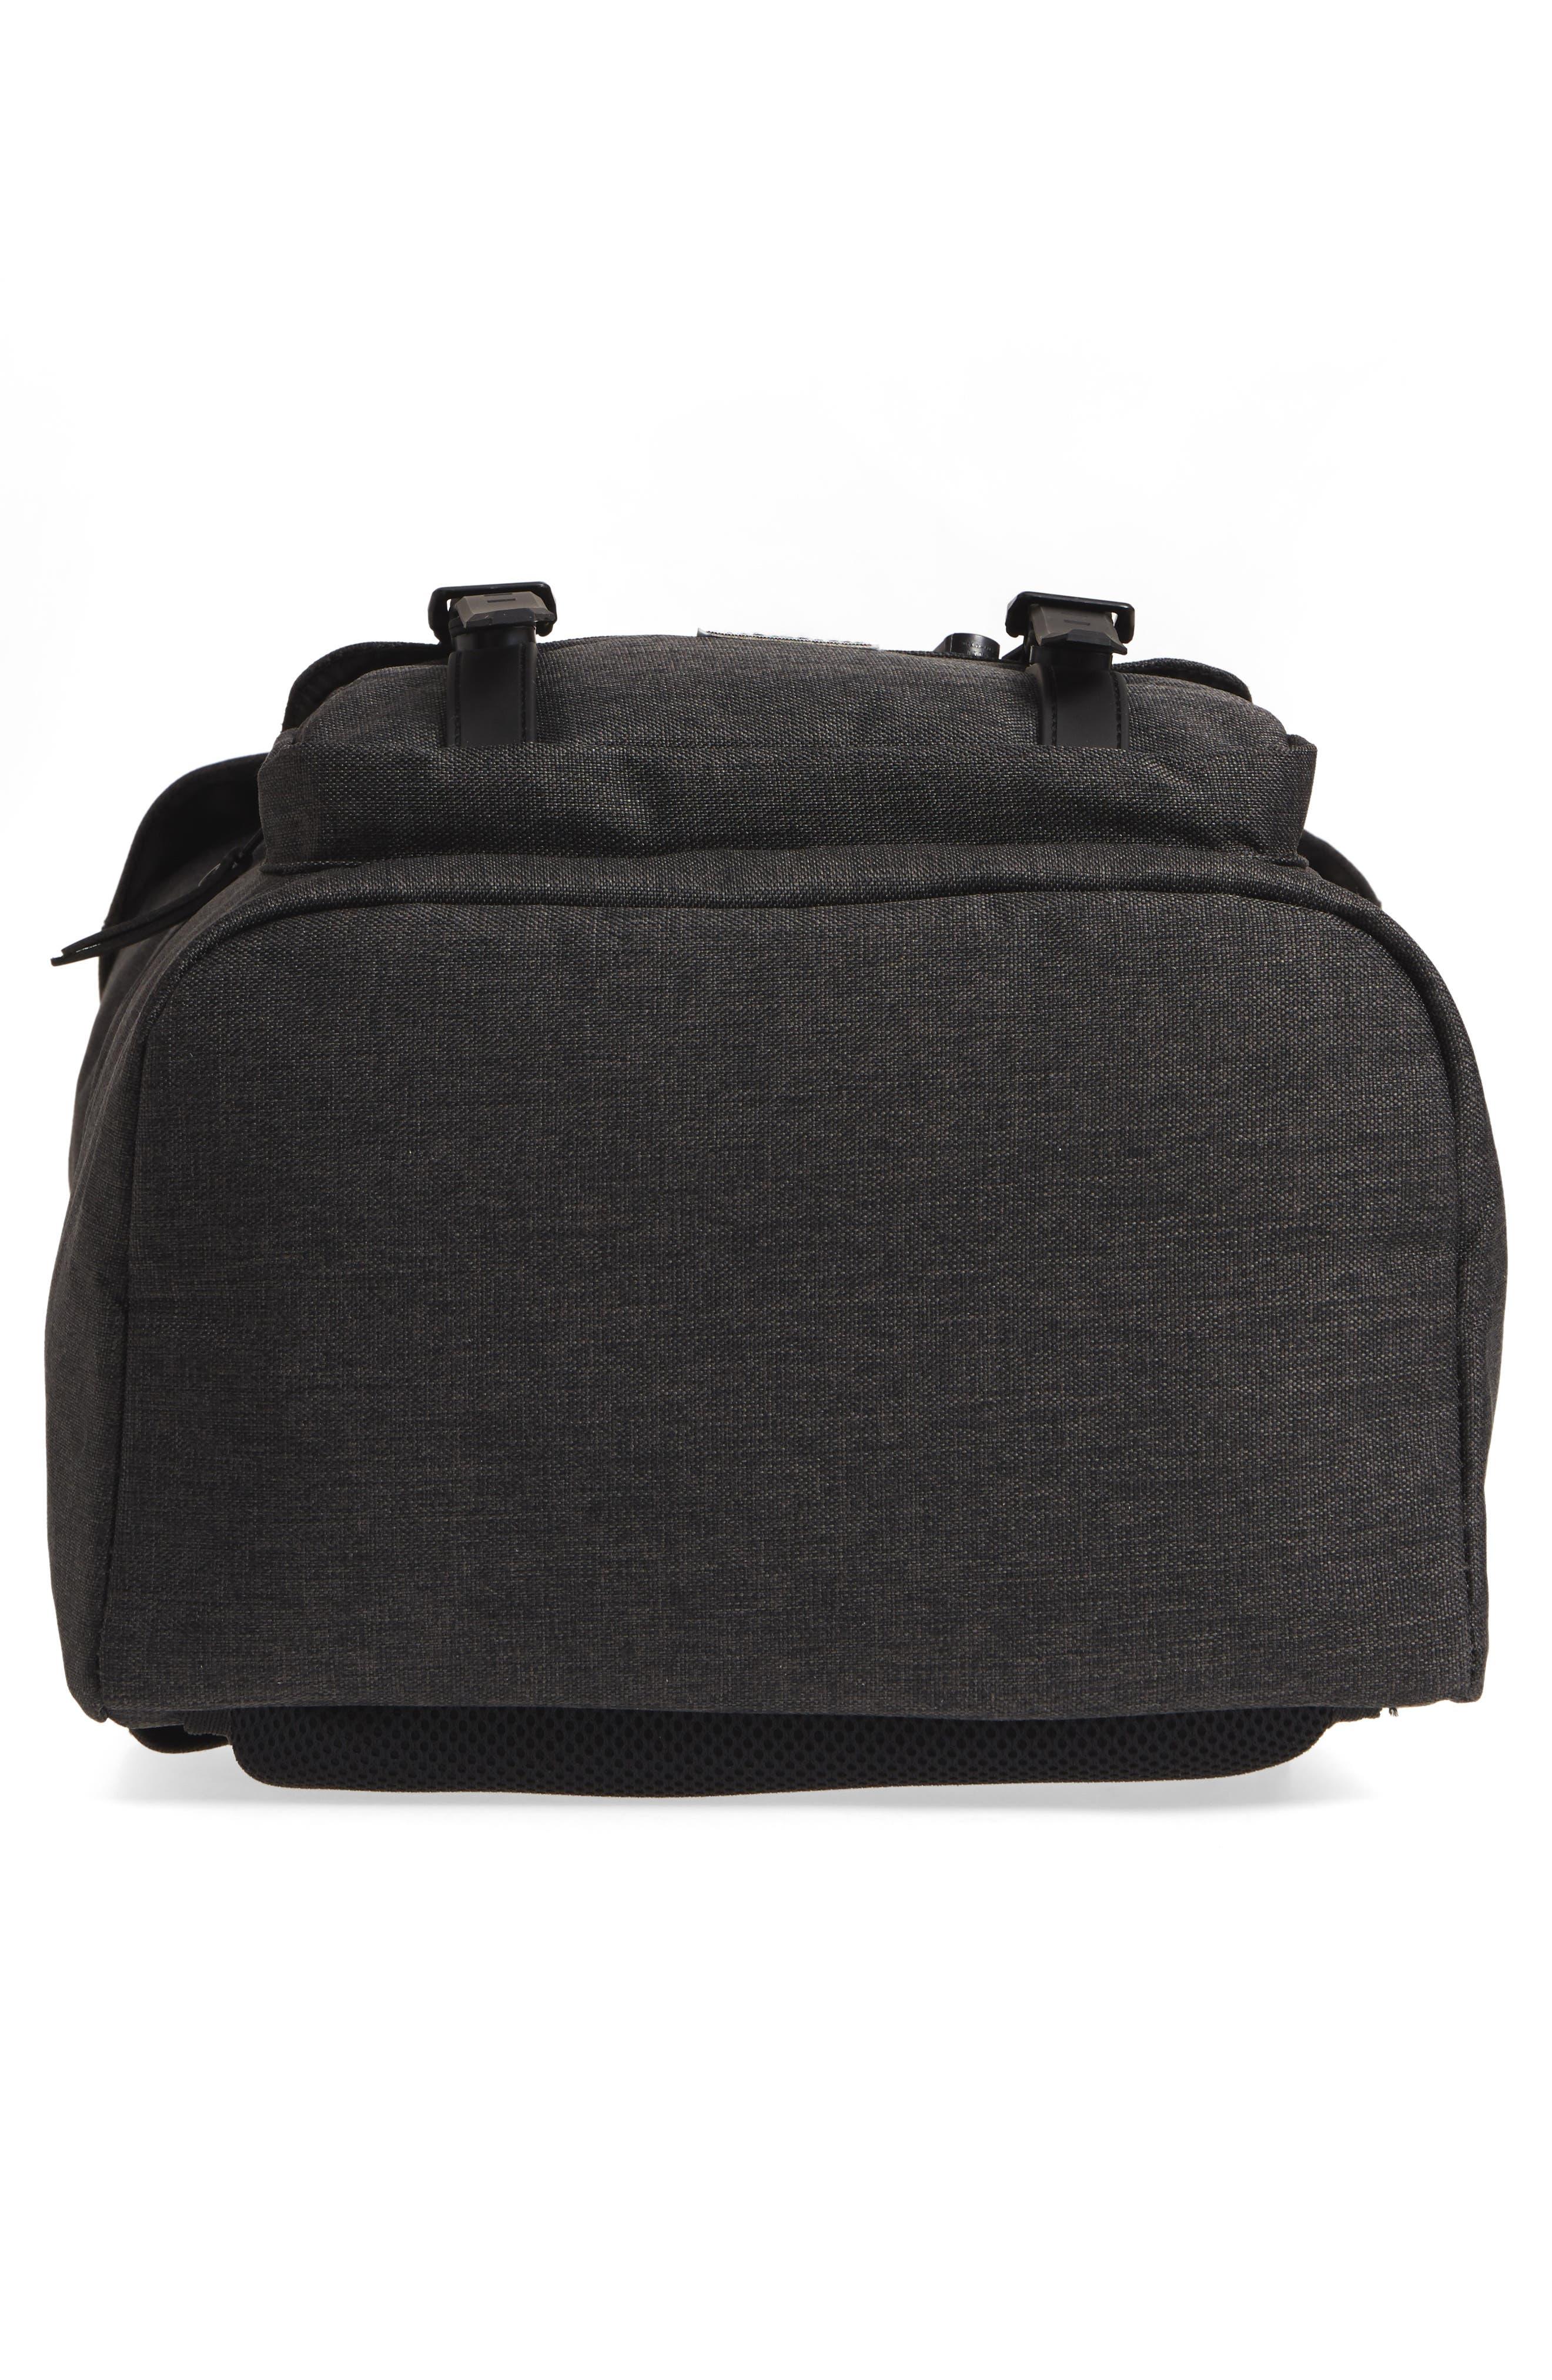 Little America - Reflective Backpack,                             Alternate thumbnail 6, color,                             Black Crosshatch/ Reflective